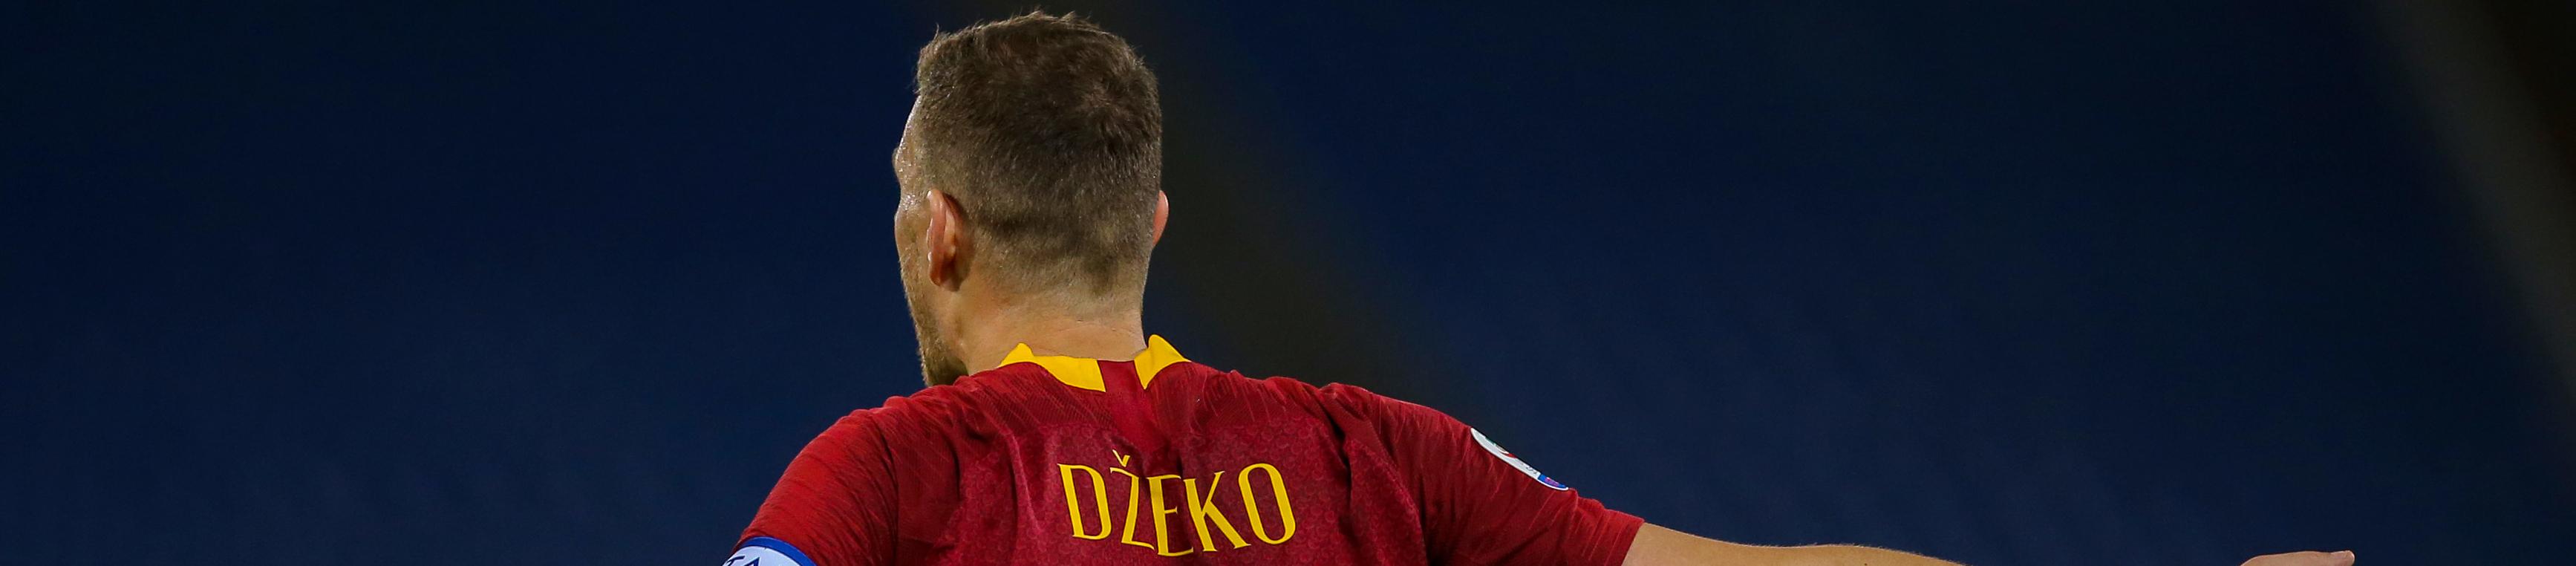 Roma-Basaksehir: giallorossi pronti al debutto europeo